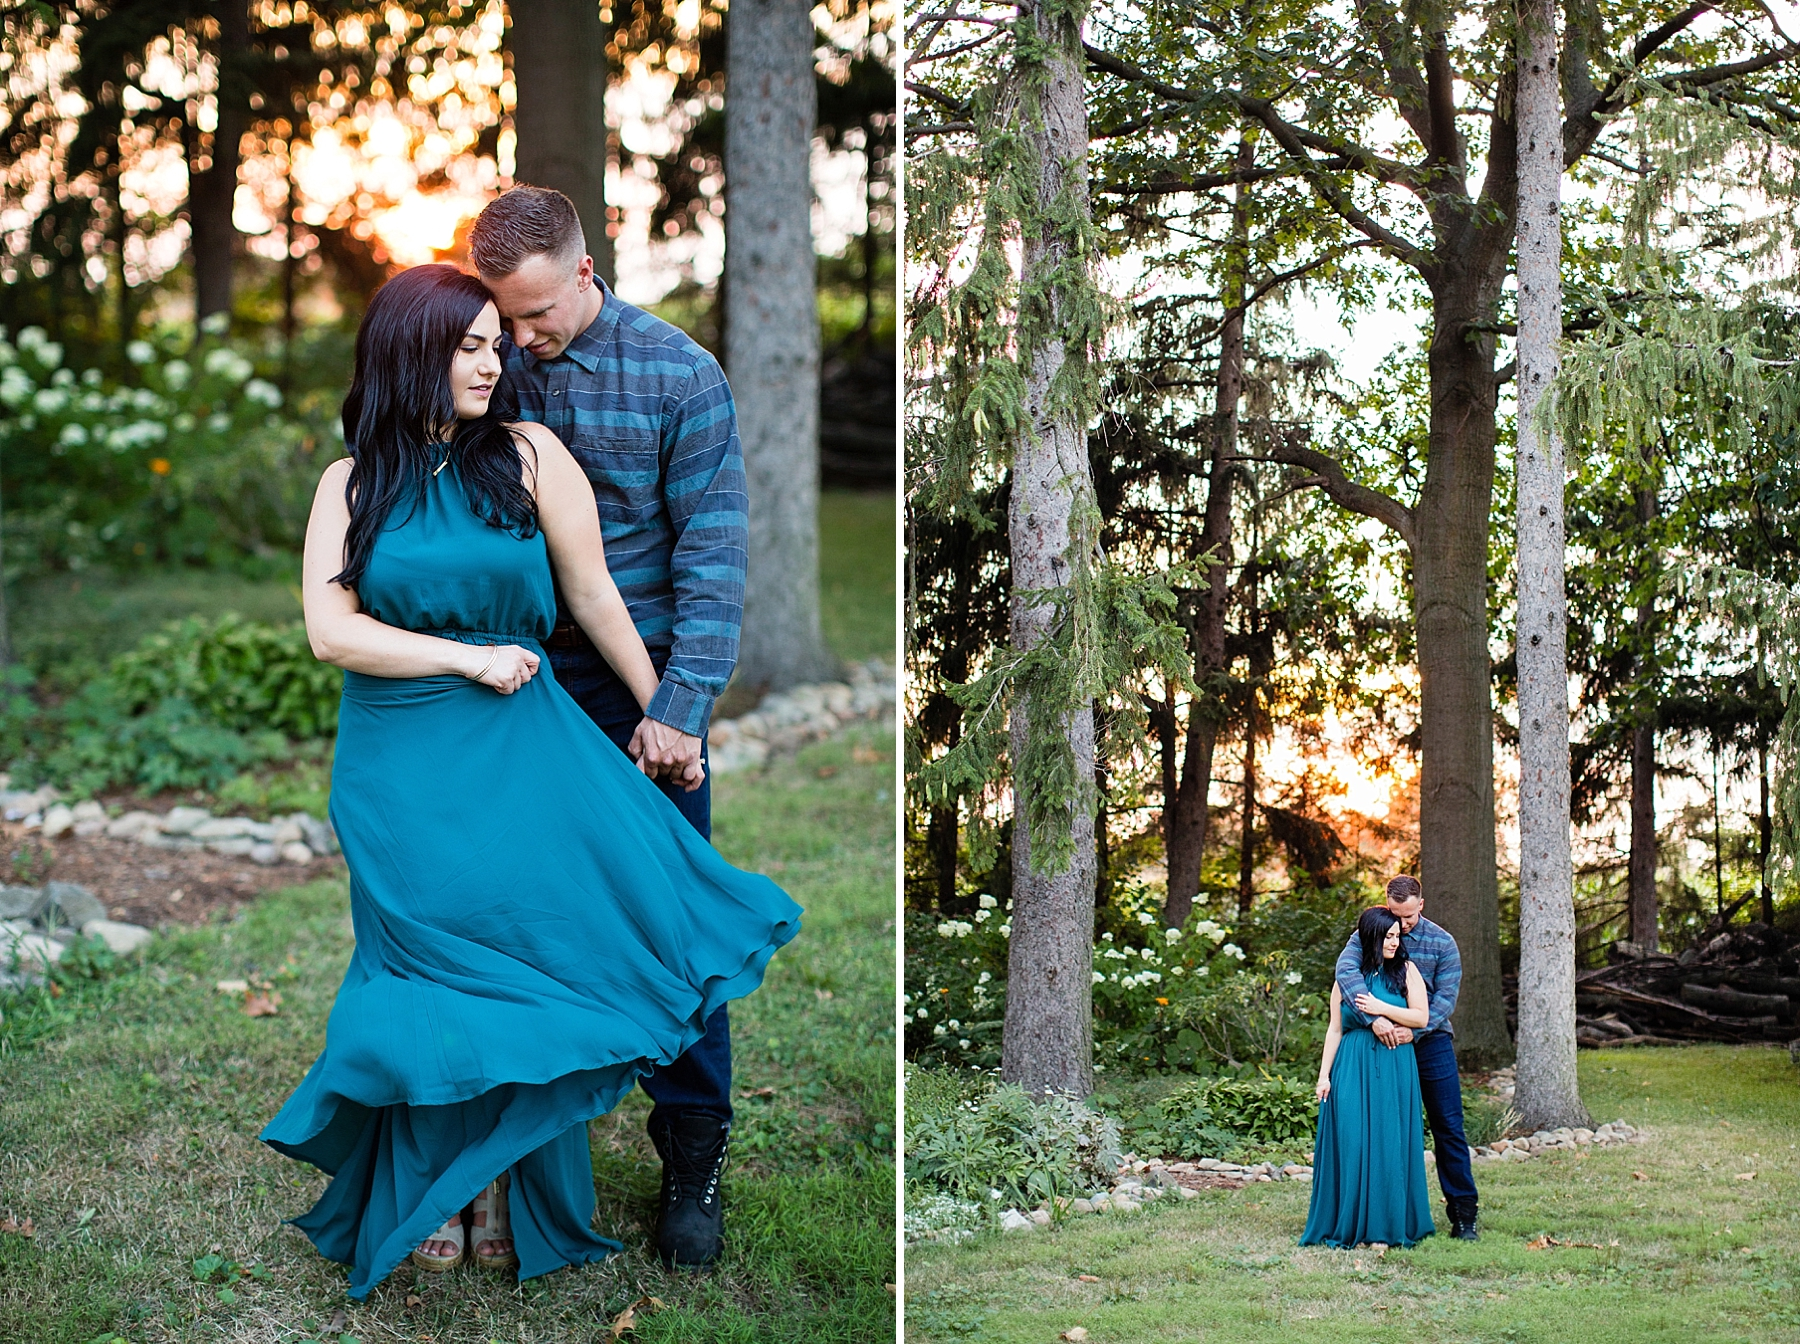 windsor-wedding-engagement-photographer-eryn-shea-photography-field-of-flowers_0023.jpg